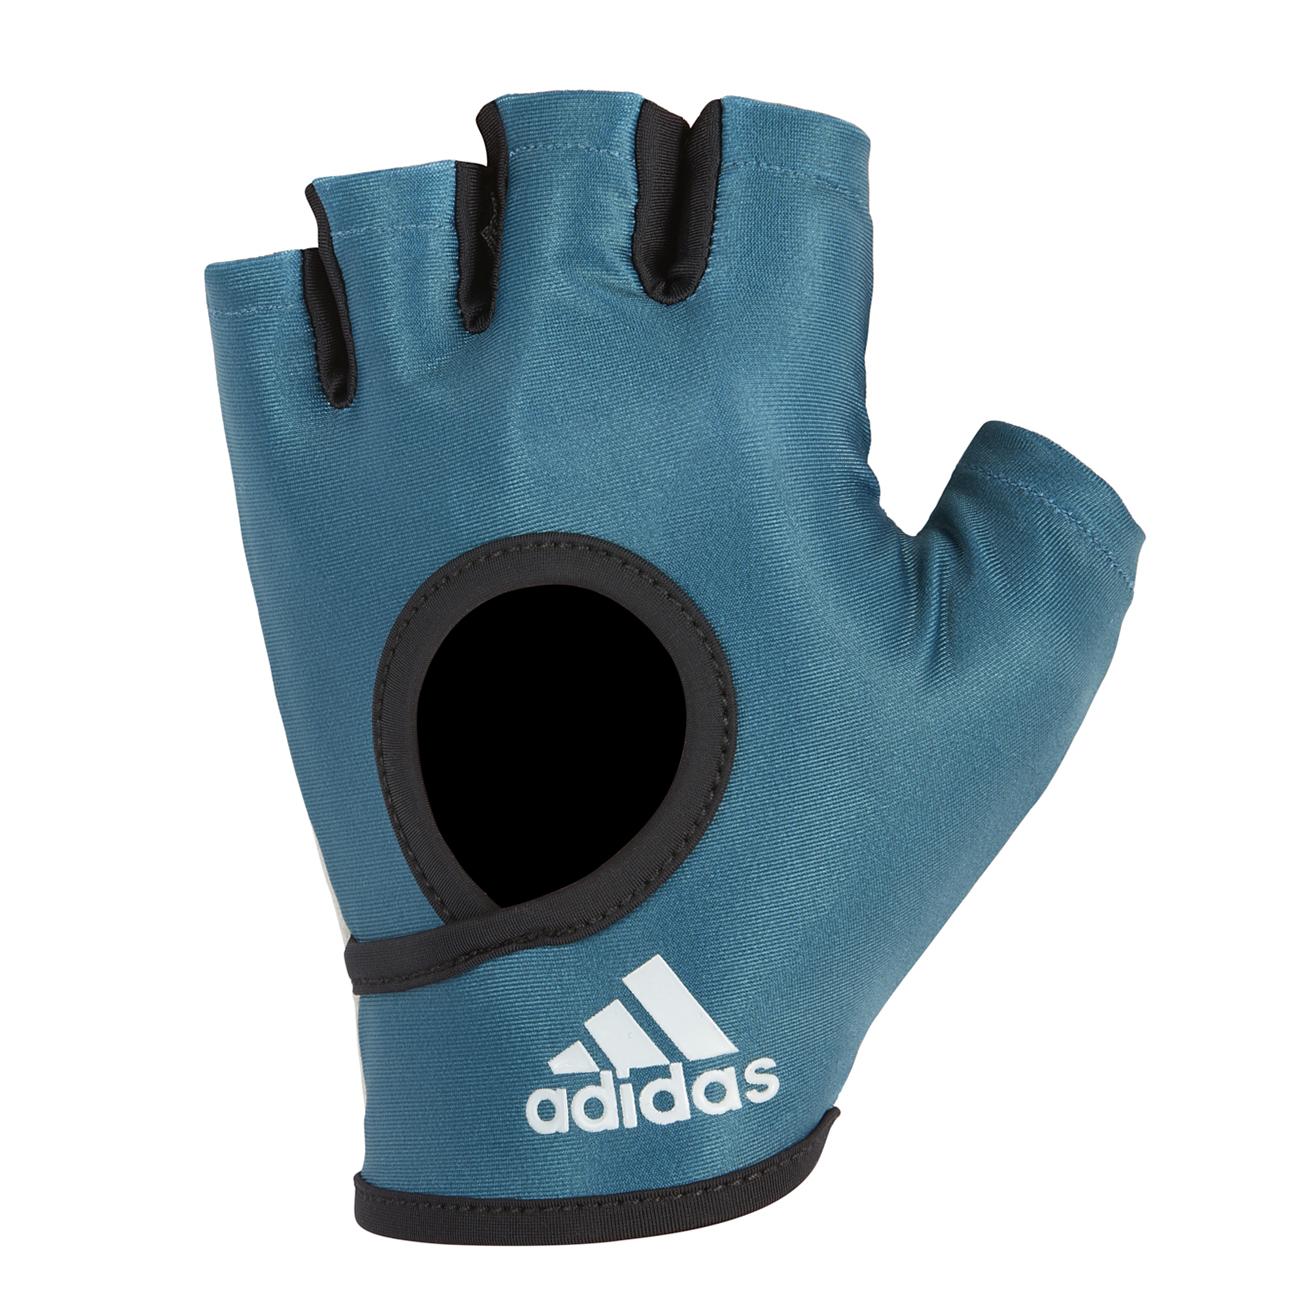 Перчатки для фитнеса Adidas ADGB-12623, синий перчатки adidas для фитнеса белые размер m adgb 12322 wh